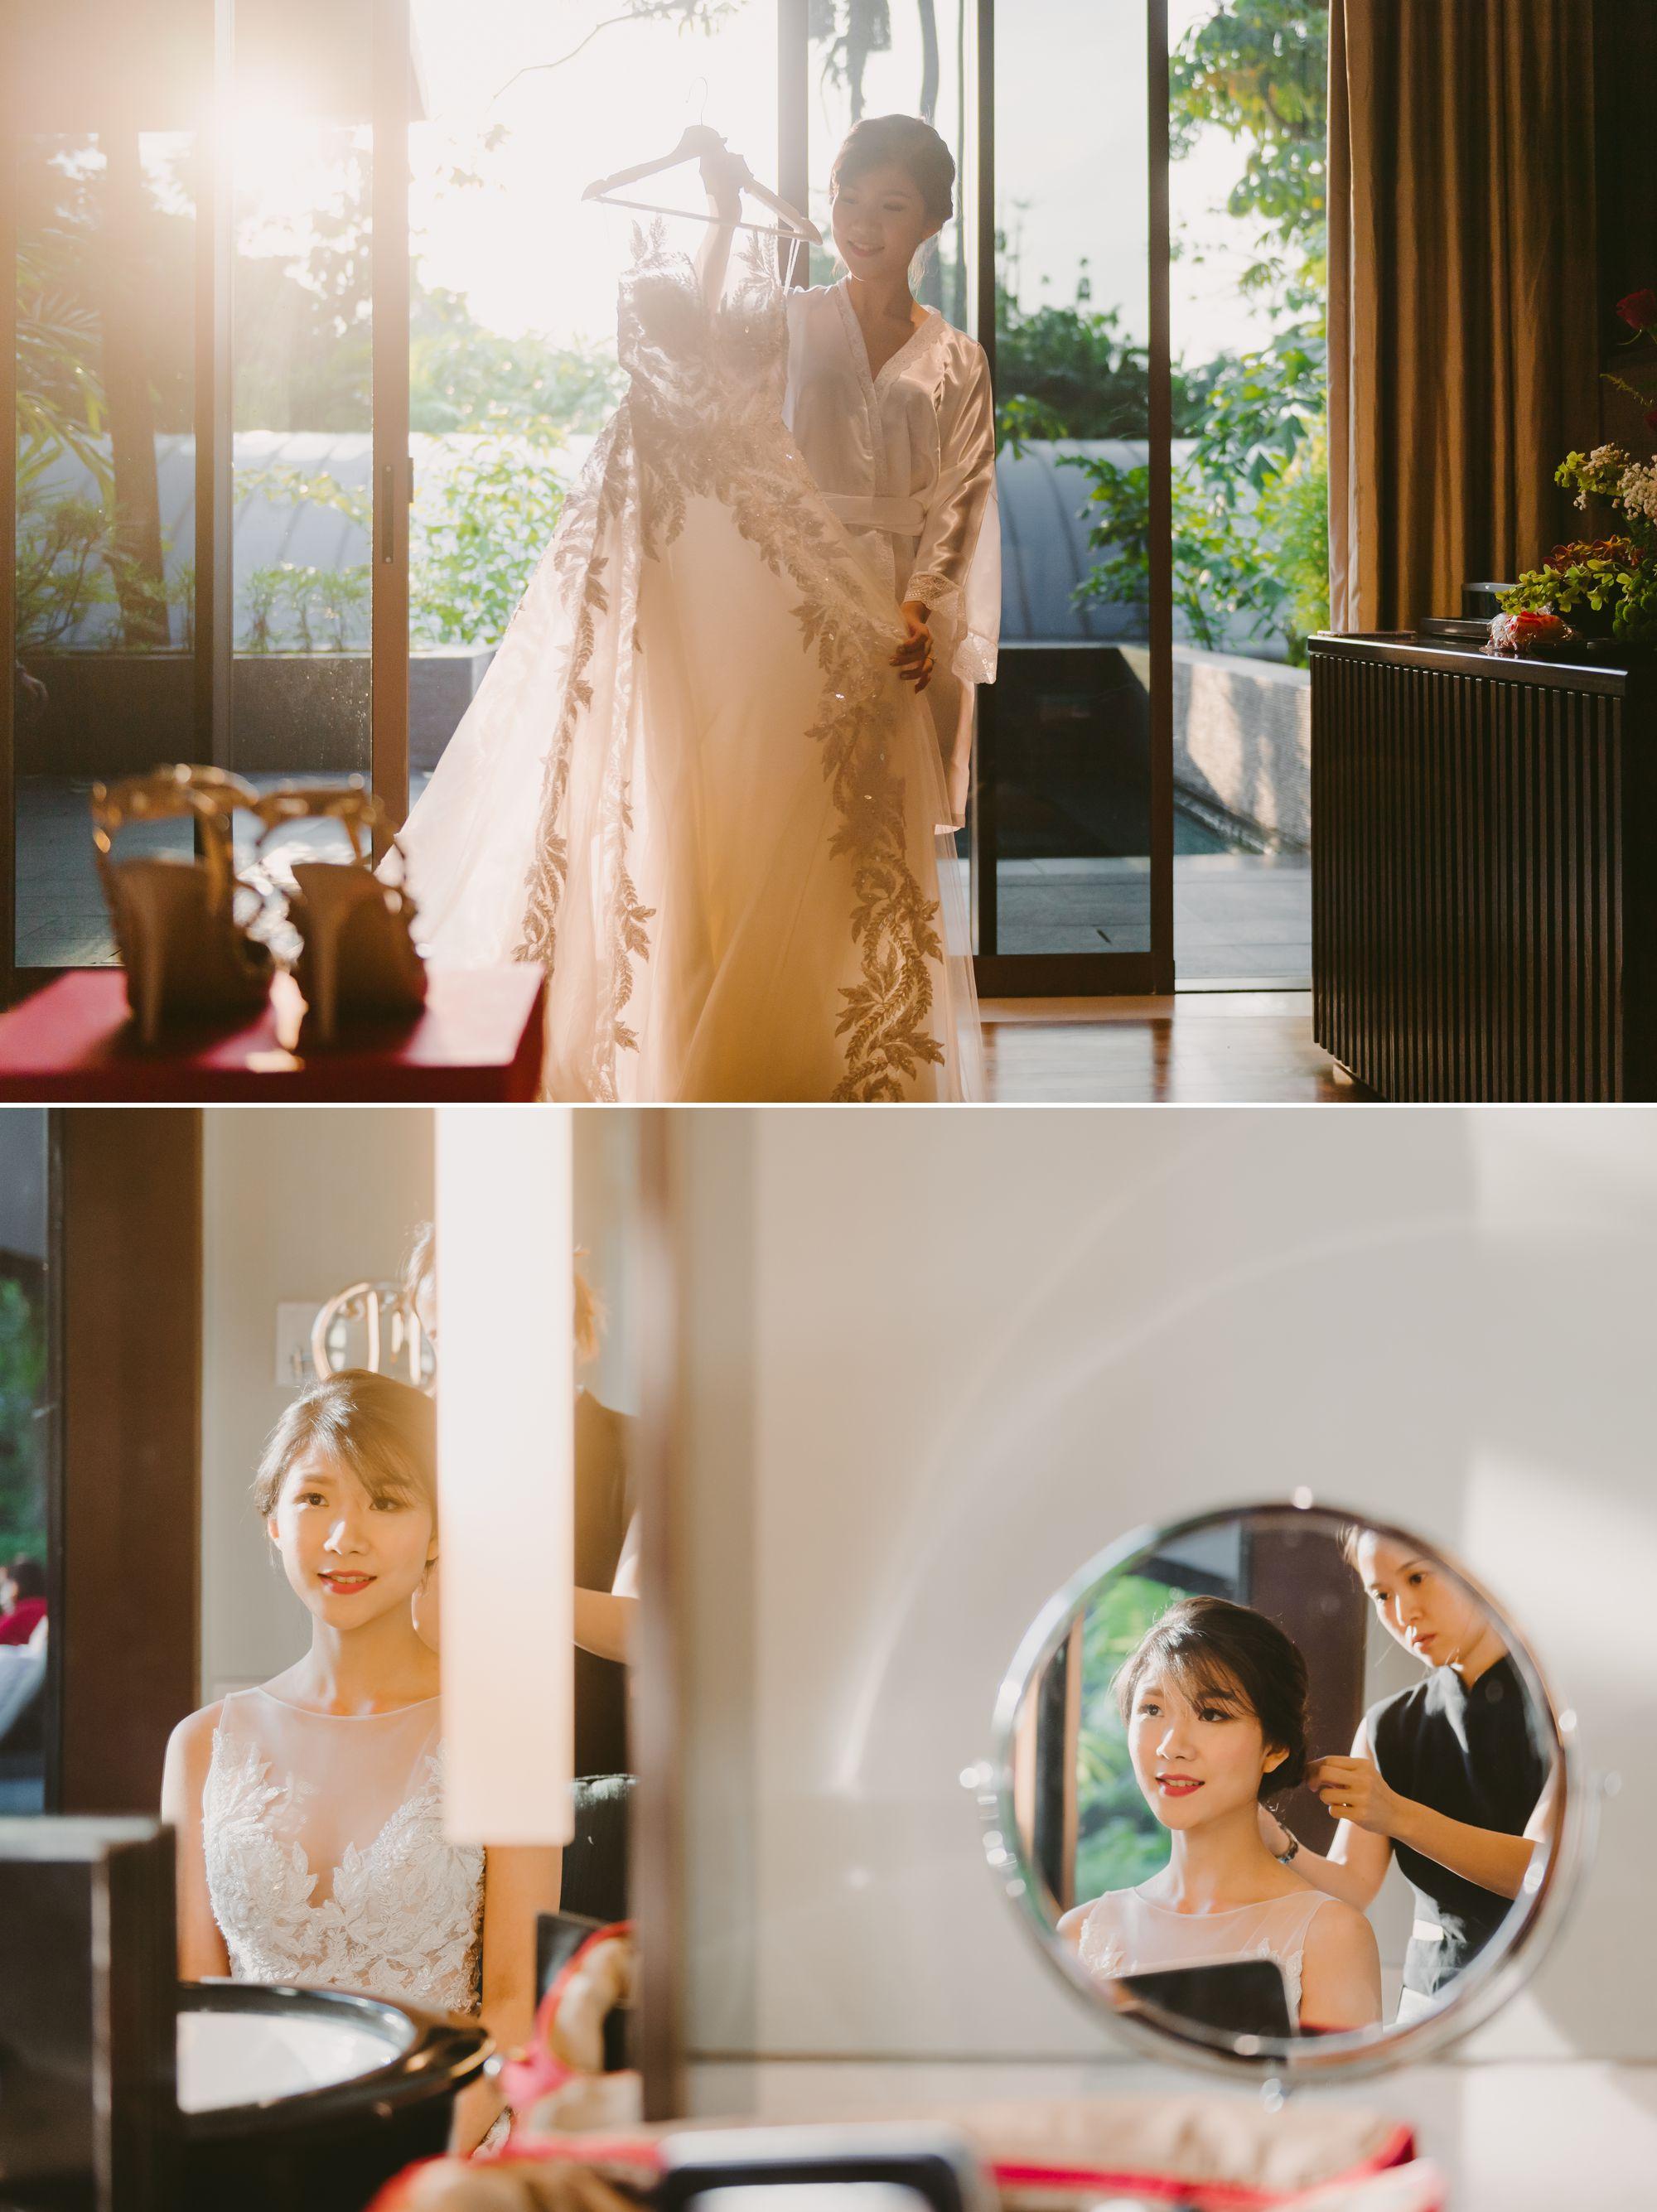 capella_wedding_photography_ 3.jpg